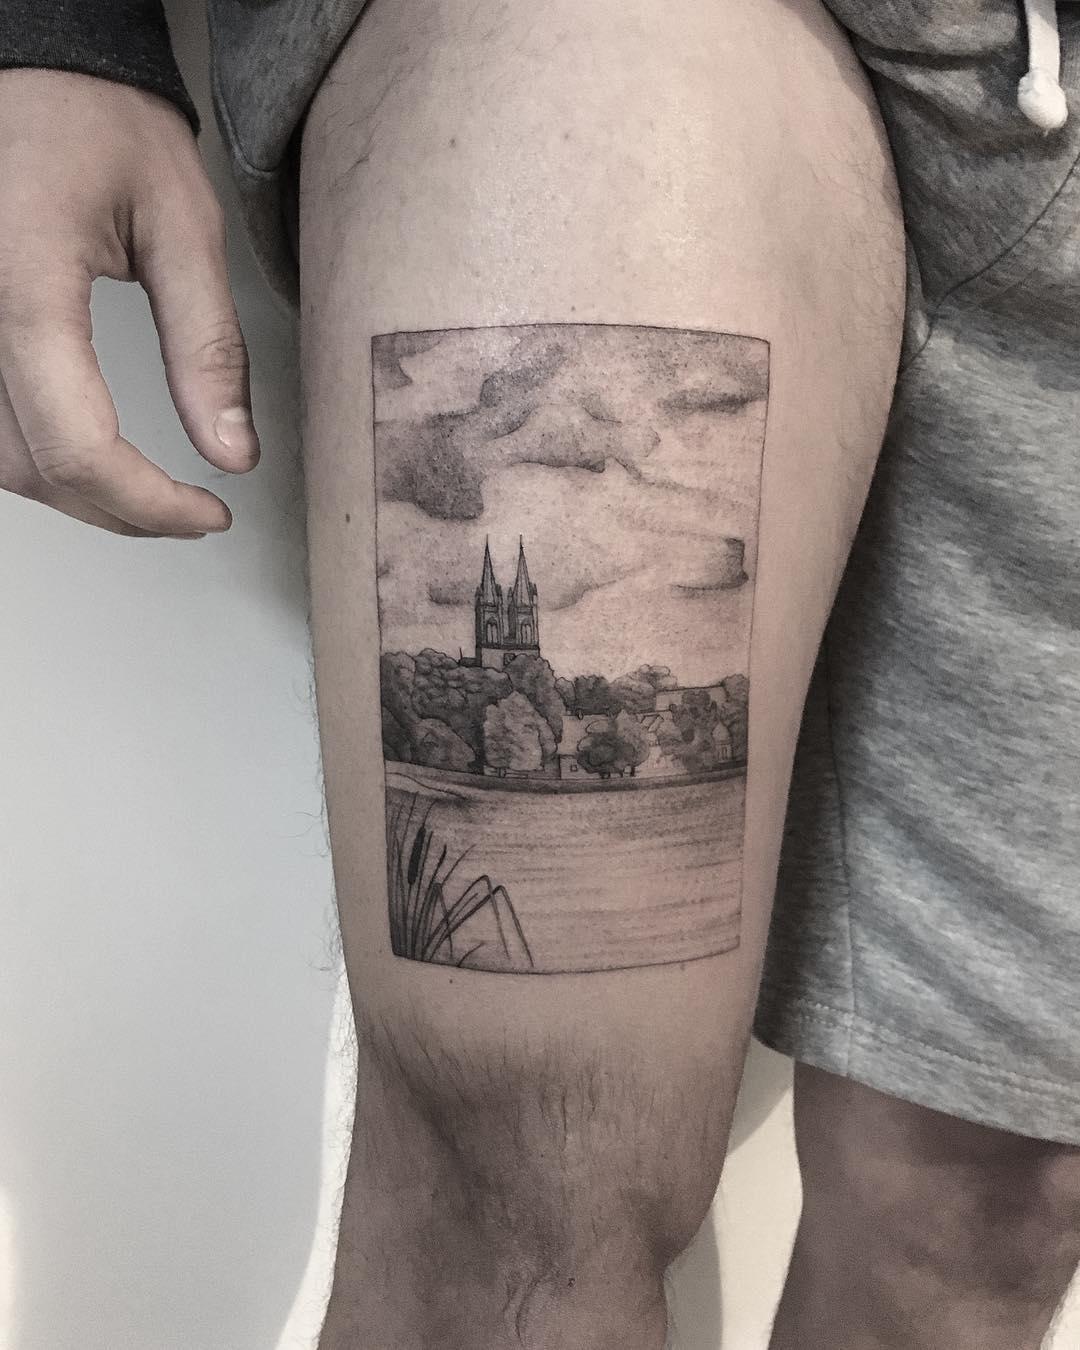 Town scenery by tattooist Spence @zz tattoo